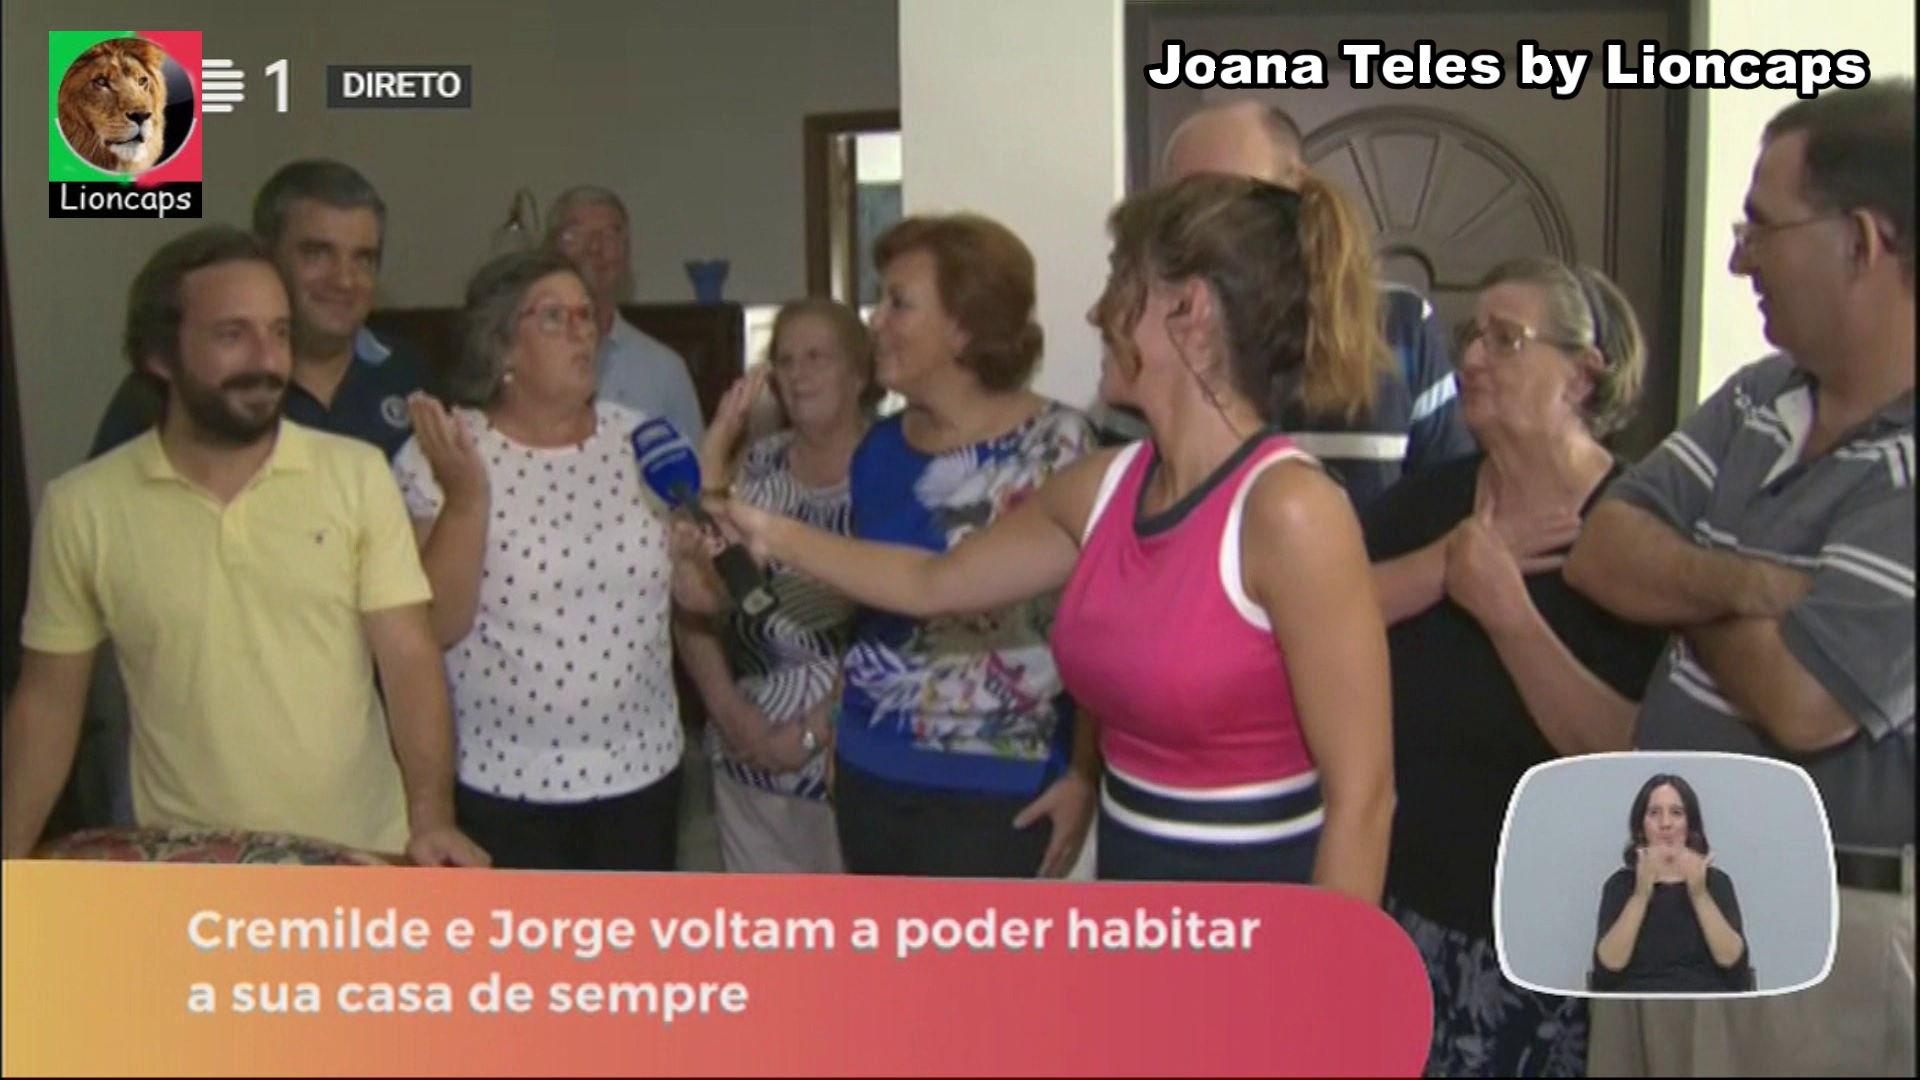 976668471_joana_teles_vs200125_1164_122_69lo.JPG